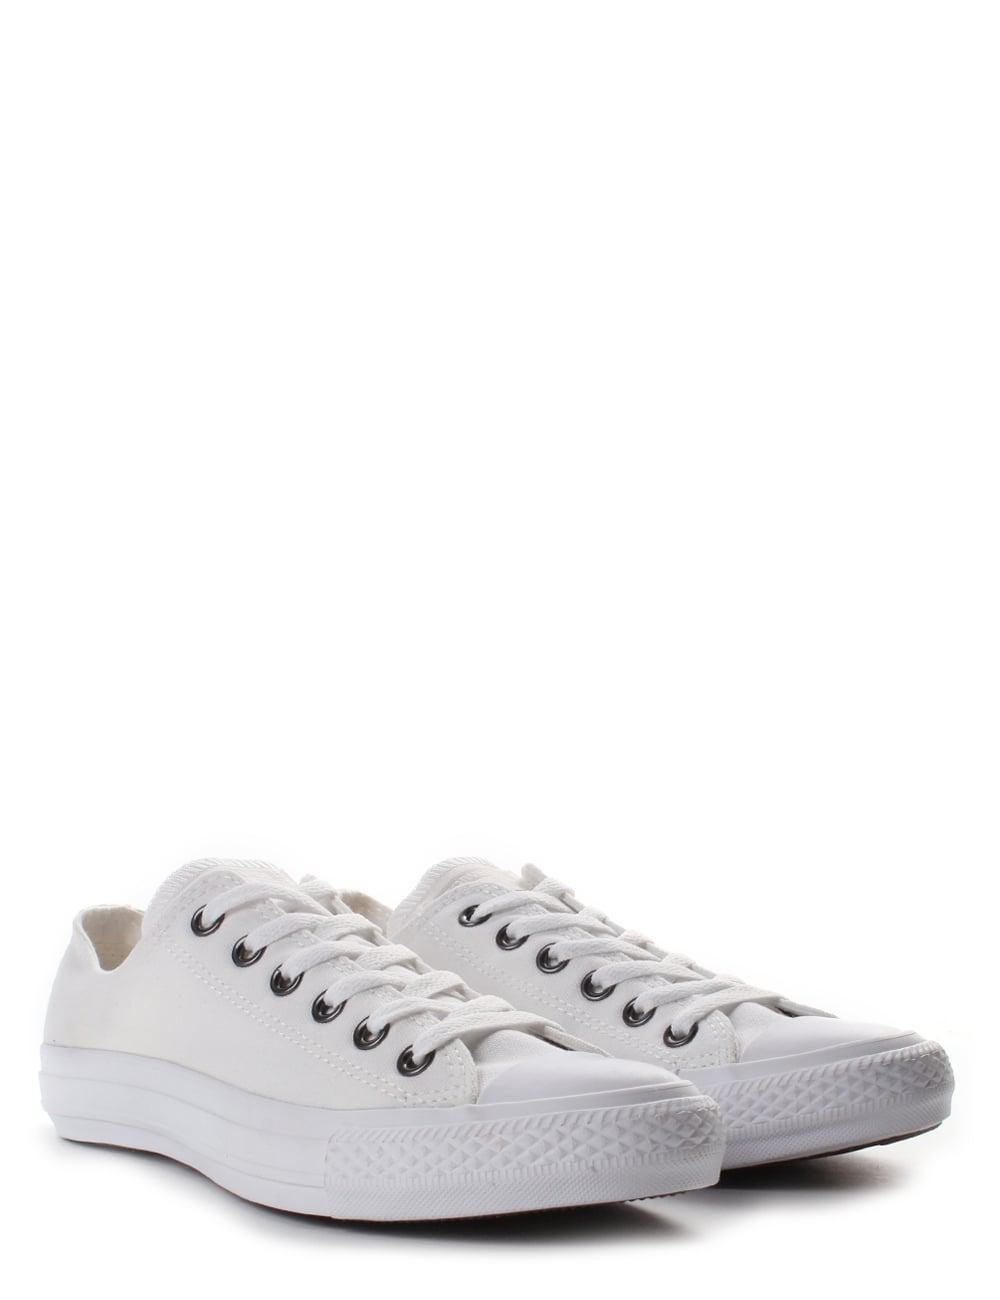 Converse Women s Chuck Taylor All Star Sneaker White Monochrome in White -  Lyst c0d3042885298